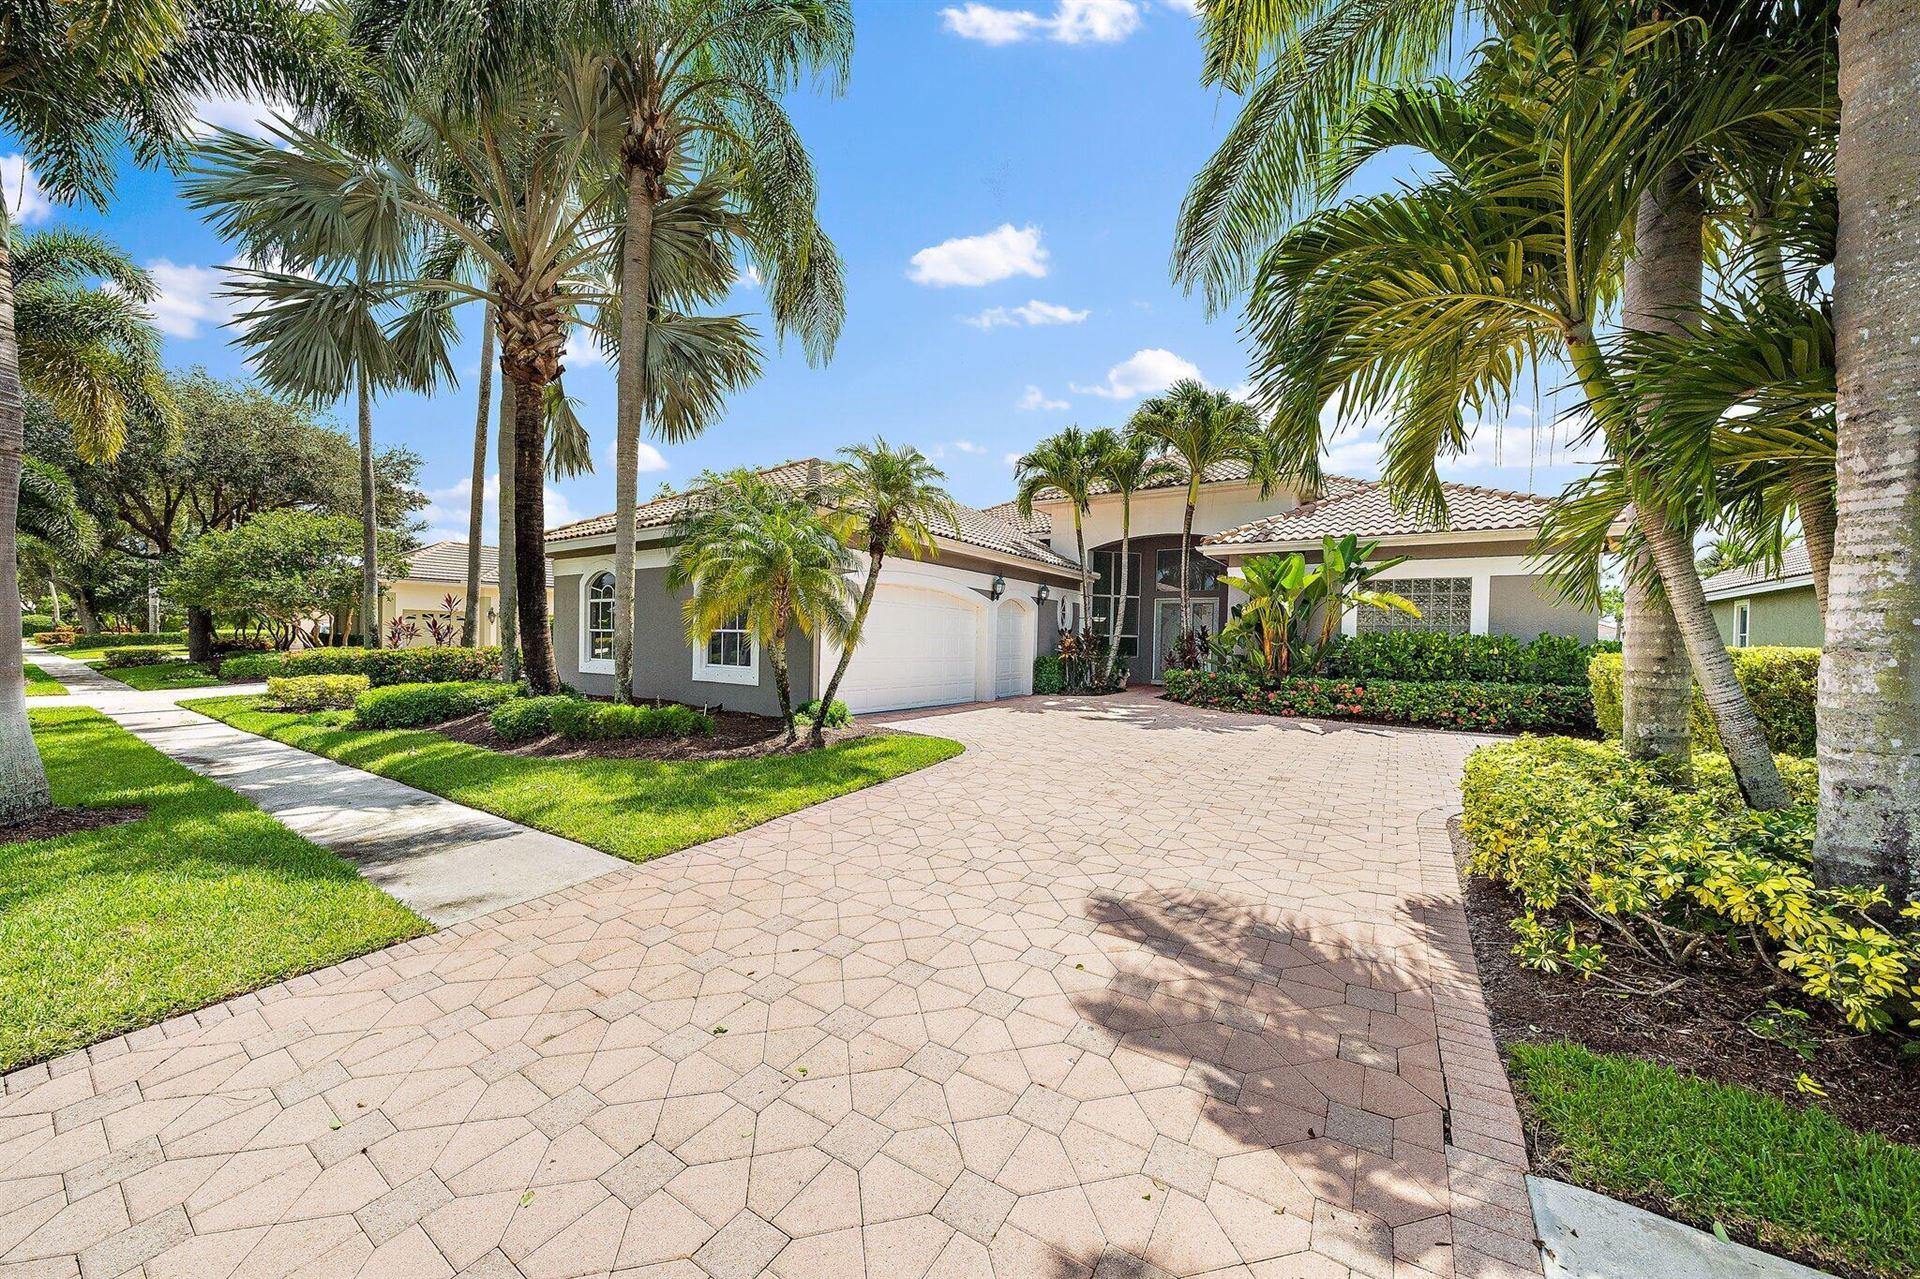 Photo of 8814 Lakes Boulevard, West Palm Beach, FL 33412 (MLS # RX-10735619)